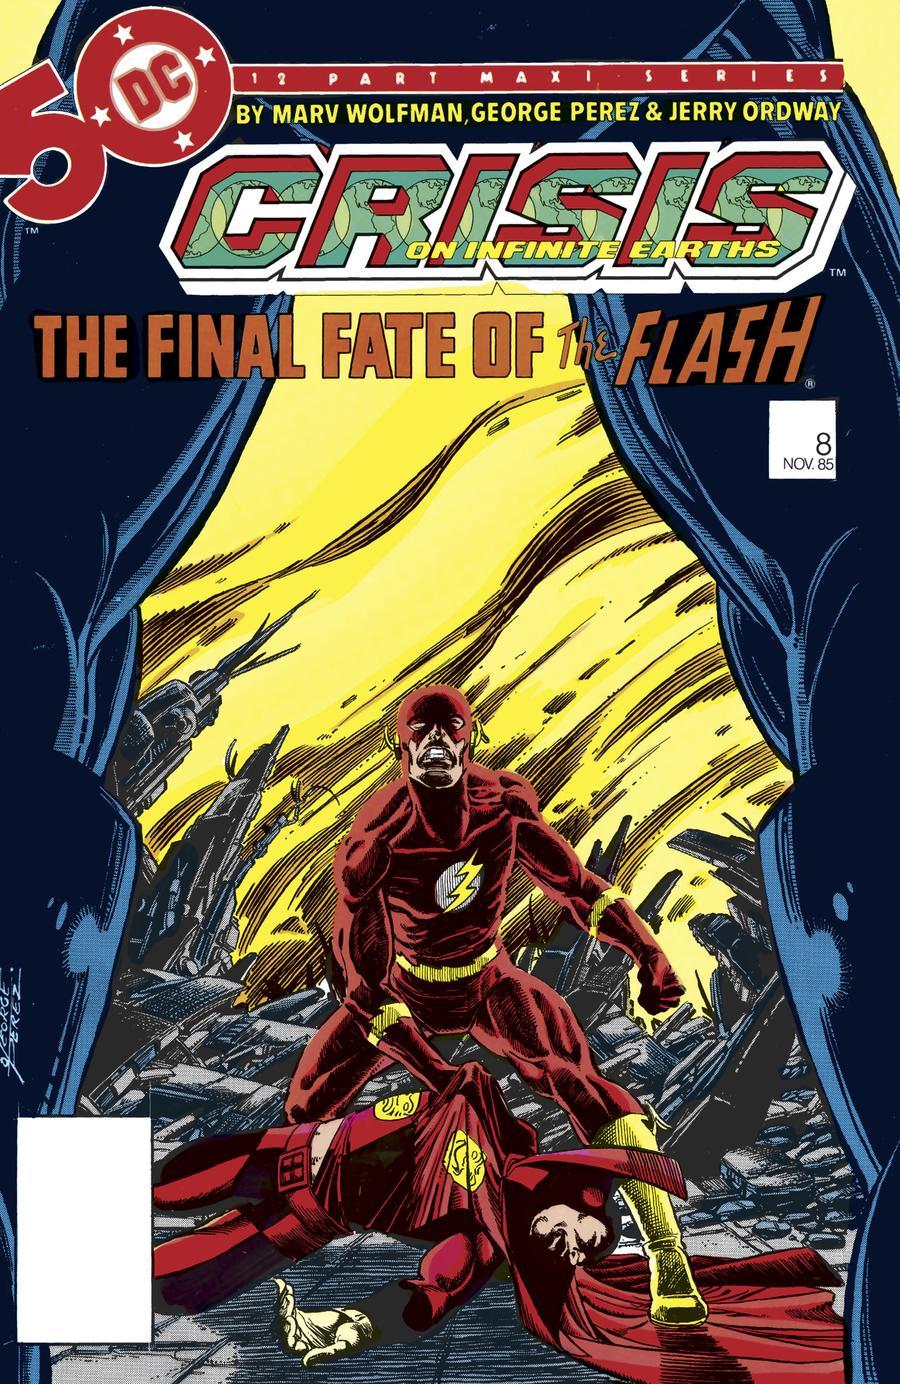 Crisis On Infinite Earths #8 Cover B Facsimile Edition